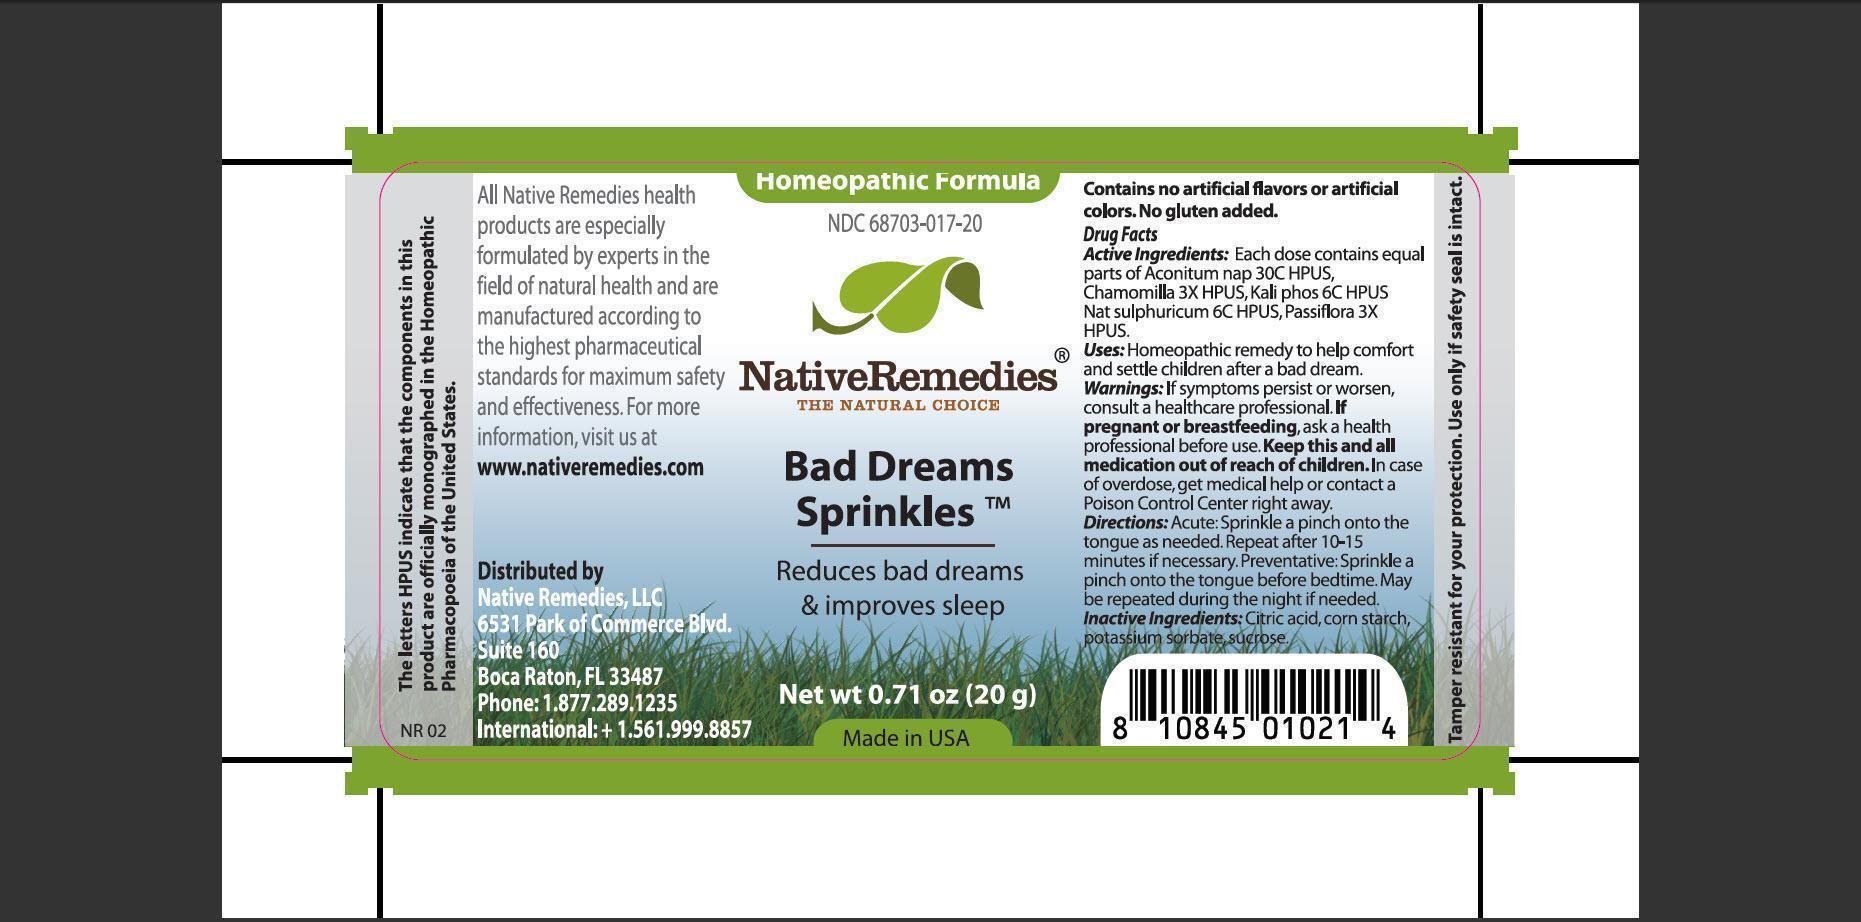 Bad Dream Sprinkles (Aconitum Nap 30c Hpus, Chamomilla 3x Hpus, Kali Phos 6c Hpus, Nat Sulphuricum 6c Hpus, Passiflora 3x Hpus) Granule [Native Remedies, Llc]